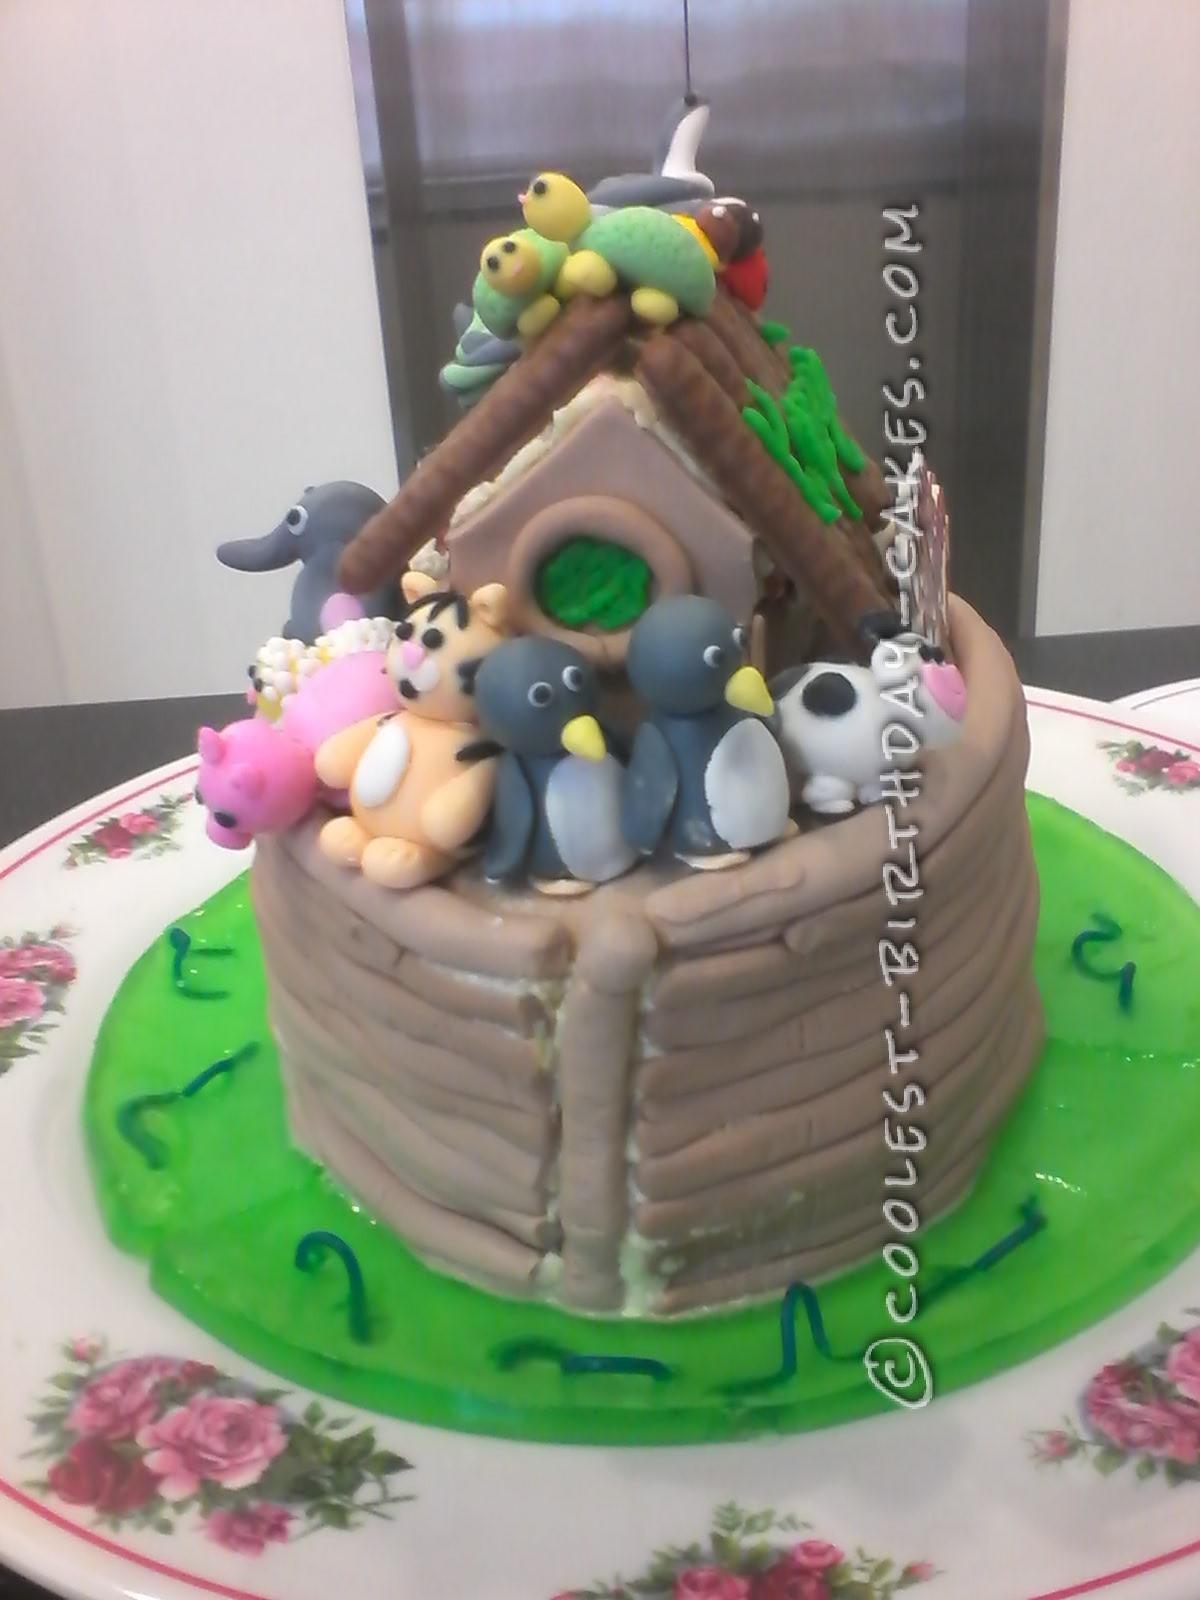 Coolest Noah's Ark Birthday Cake